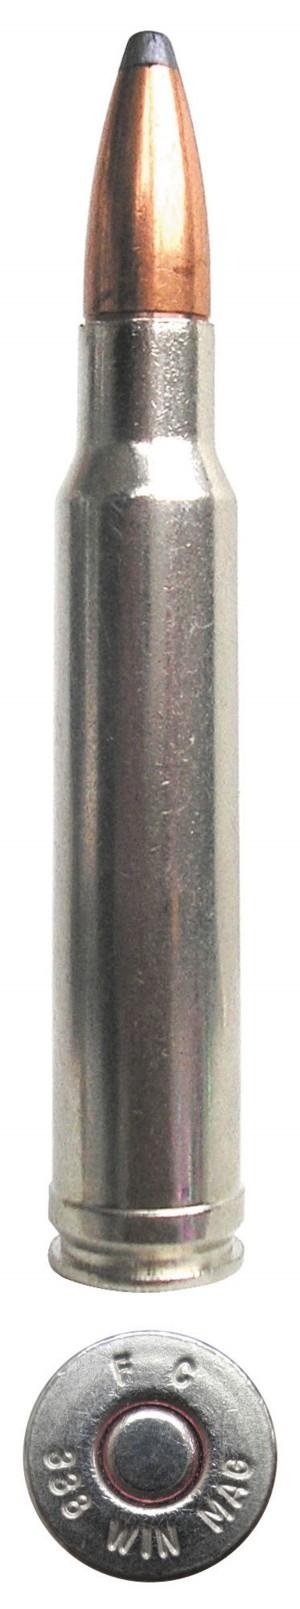 Патрон .338 Winchester Magnum производства компании Federal Cartridge Company